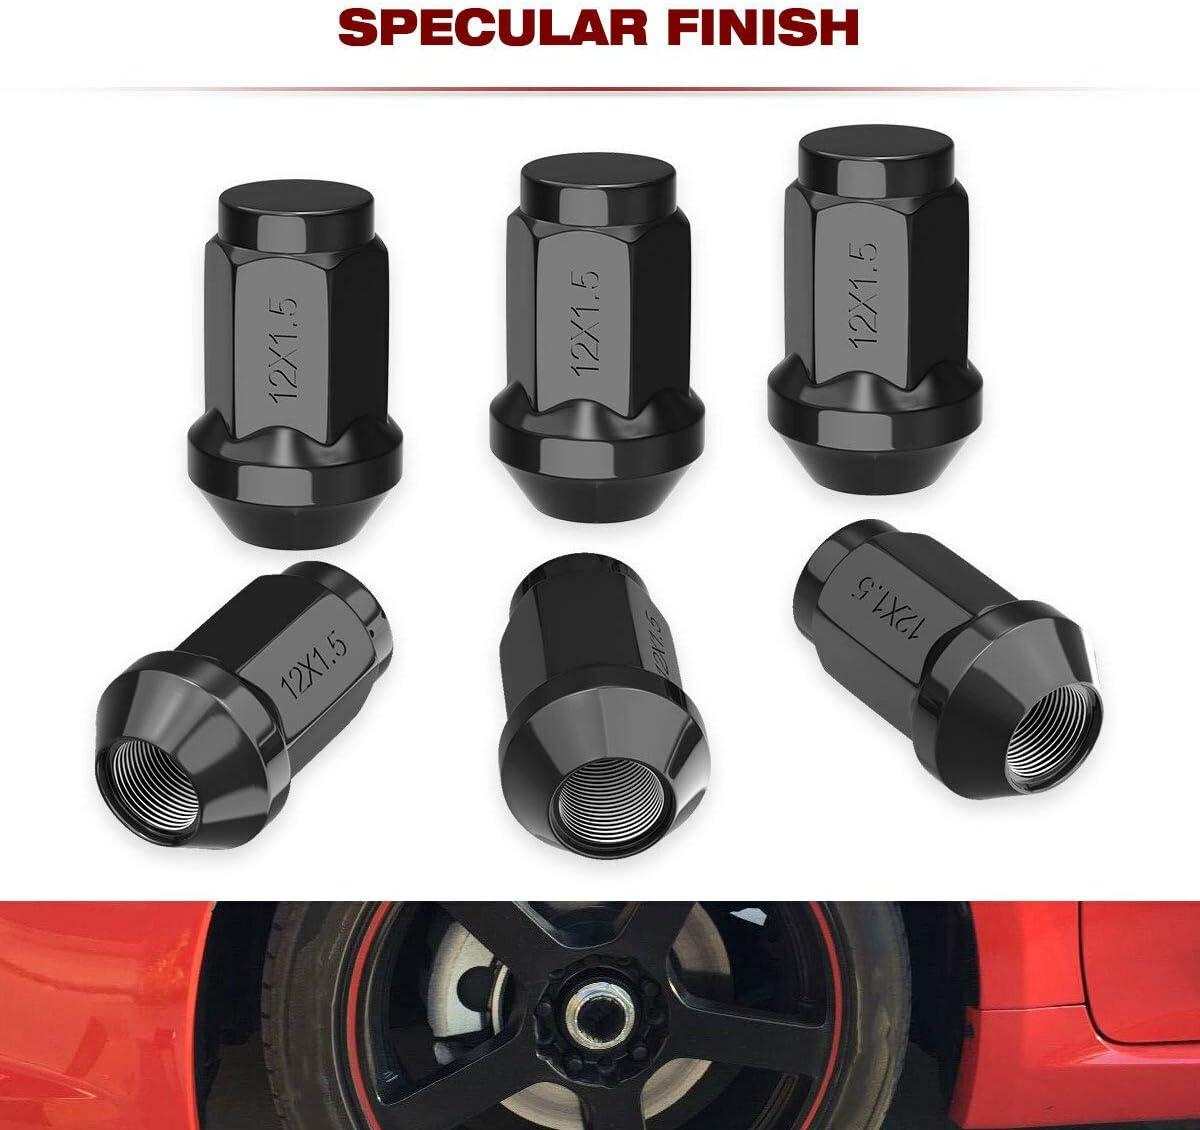 SHENGYAWAUTO 24 PCS Black 7 Spline 14x1.5 Truck Lock Lug Nuts for Chevy Gmc 6x5.5 Toyota Cadillac